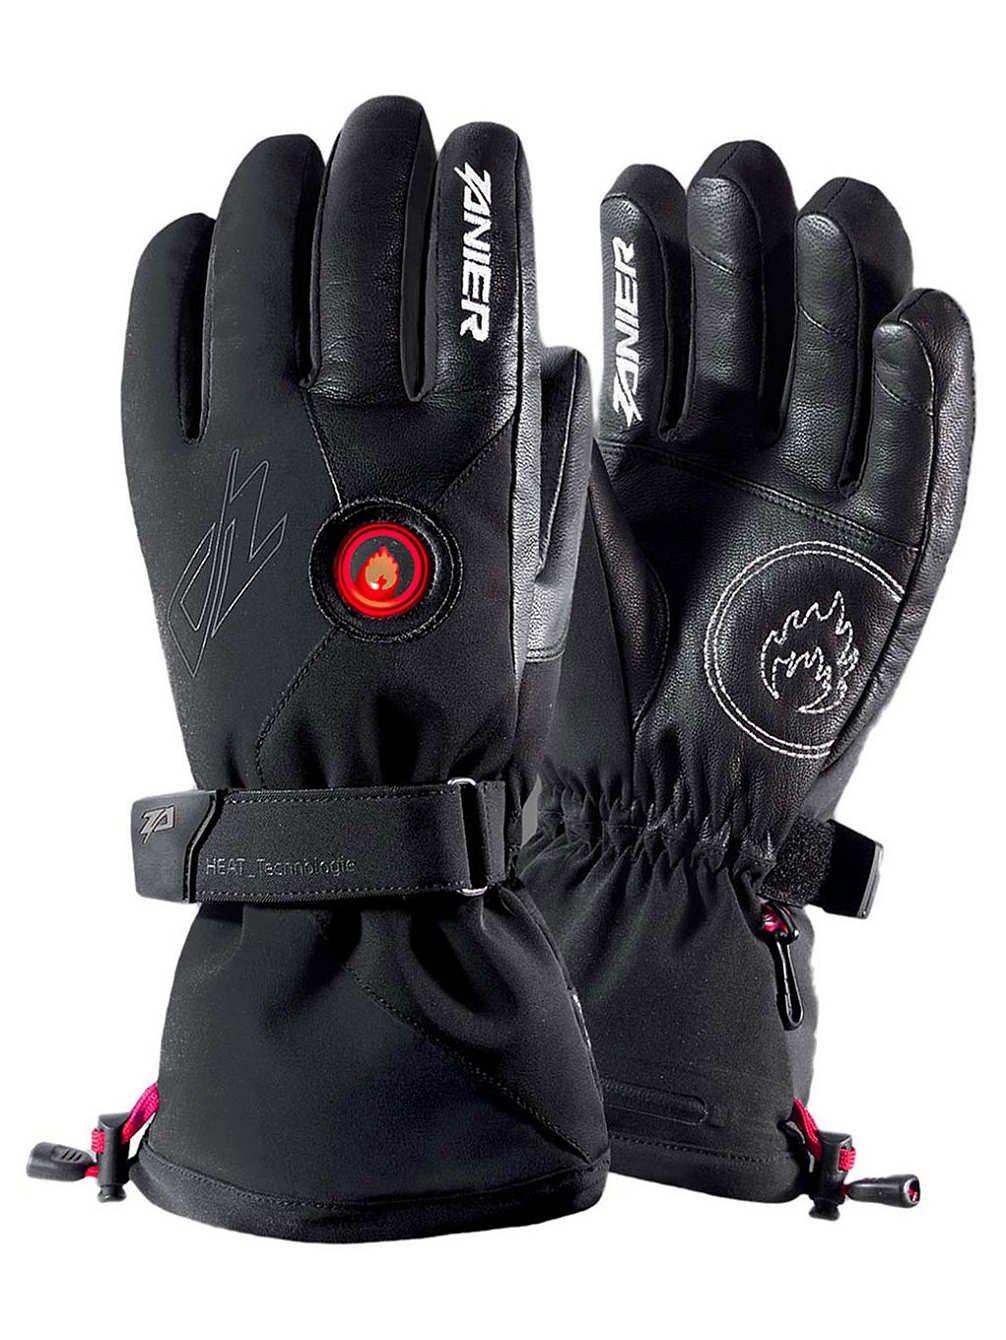 Zanier Damen Handschuhe Heat.GTX